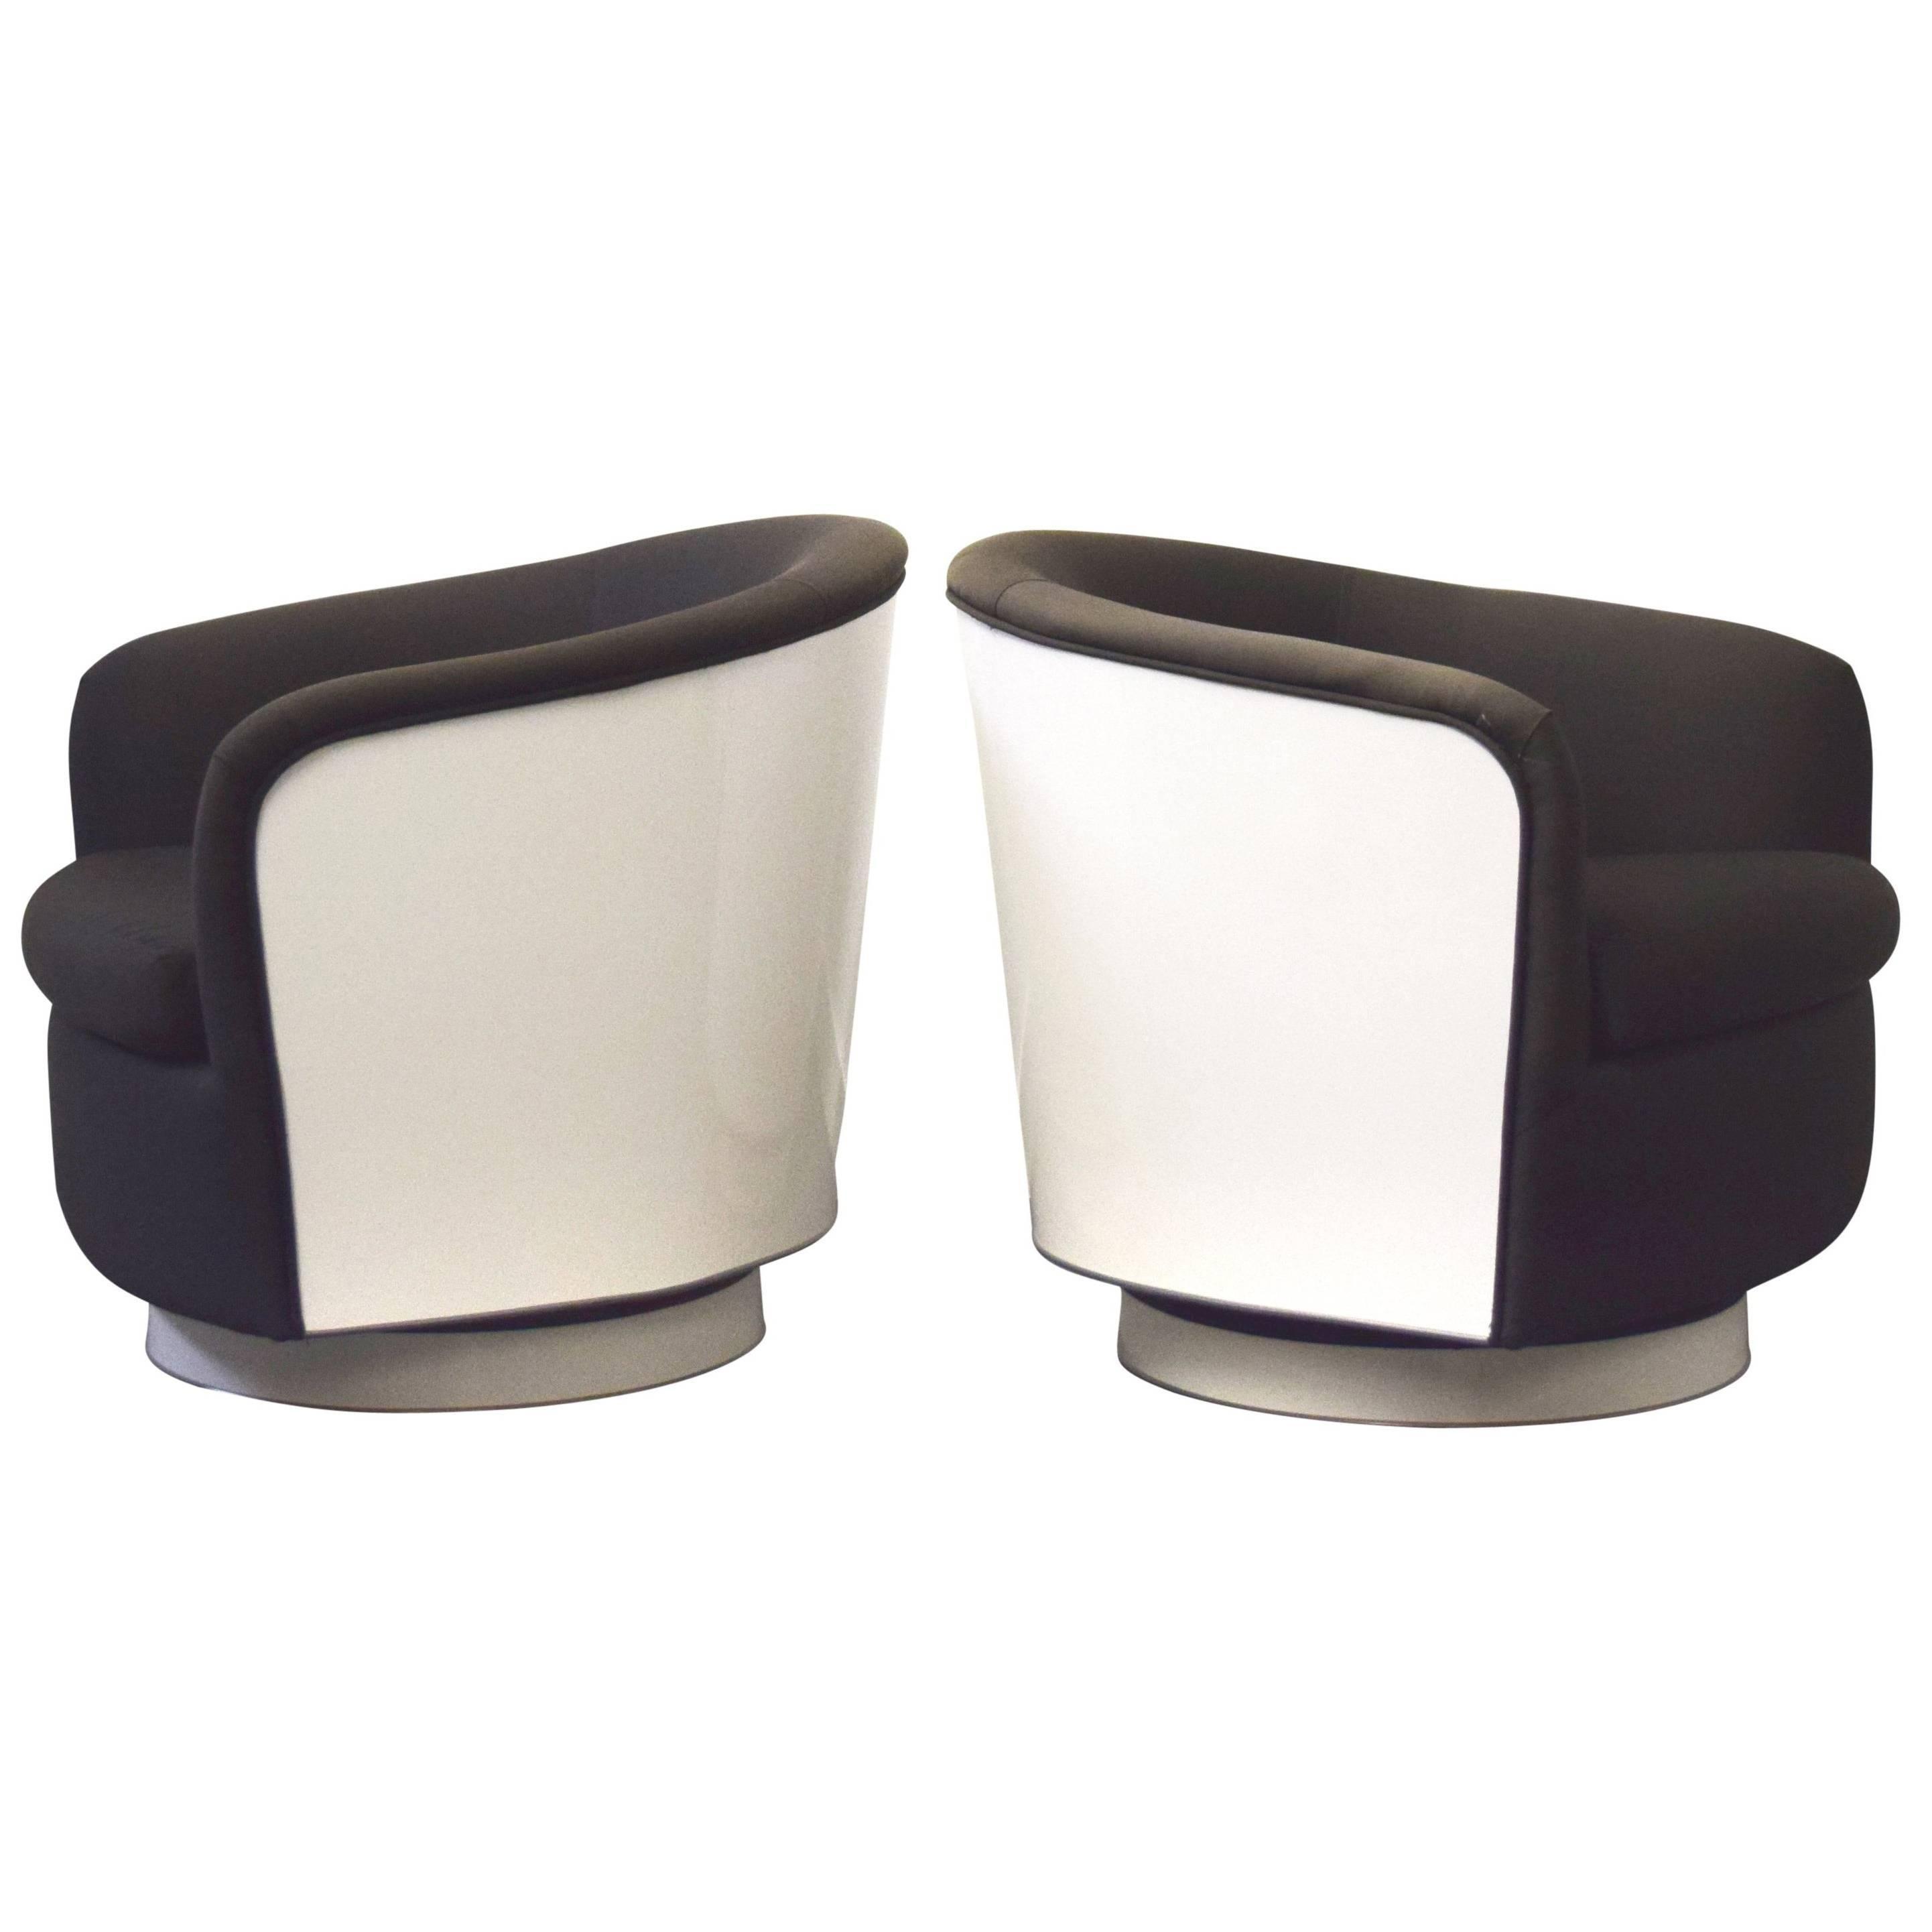 Milo Baughman Swivel and Tilt Lounge Chairs